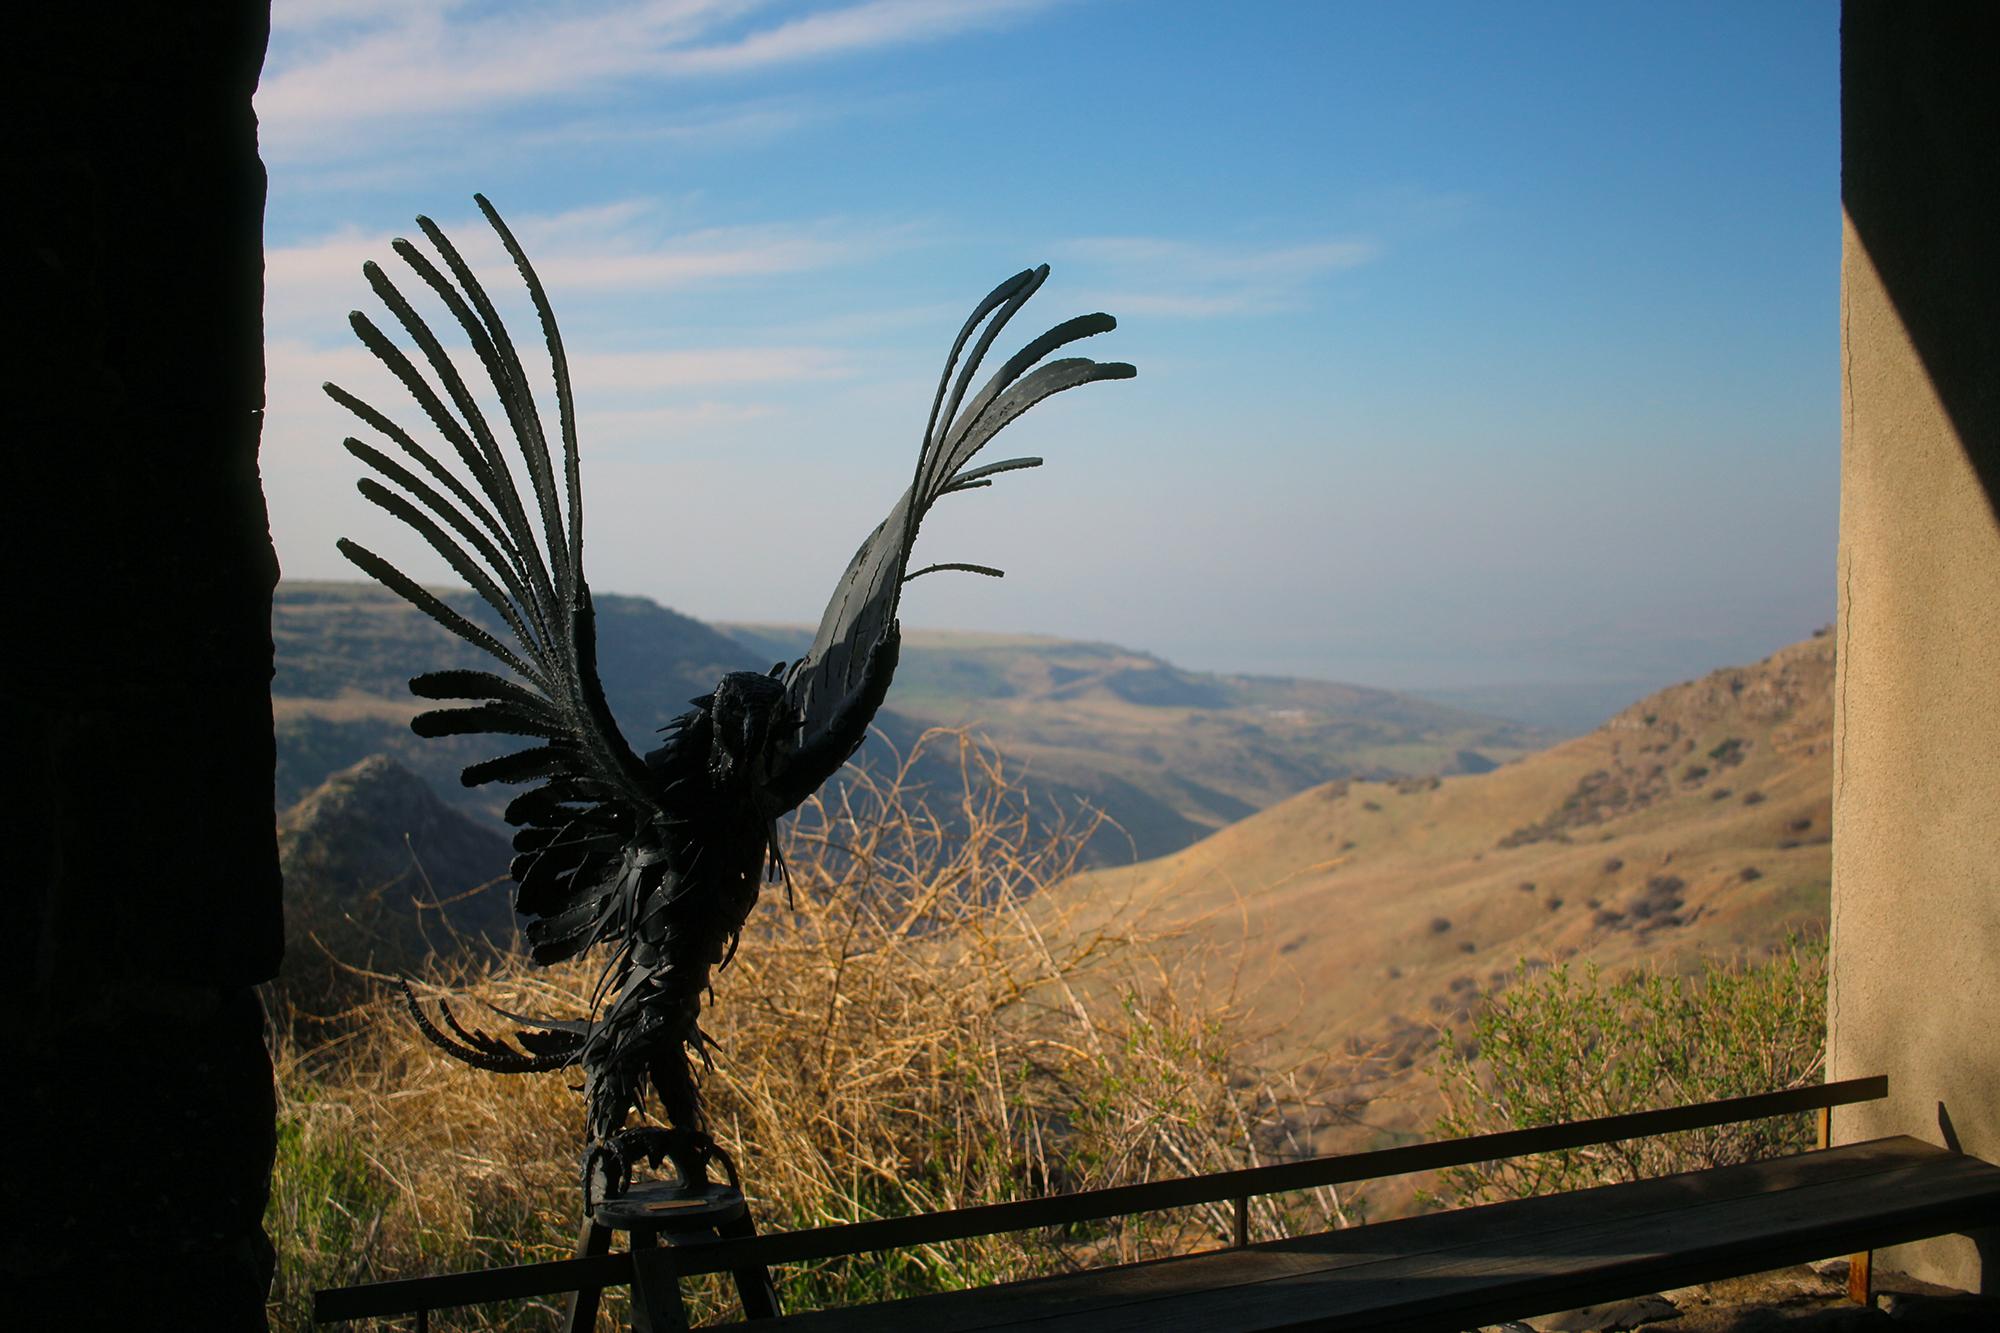 The vulture look-out at Gamla in Golan Heights, Israel. View across Gamla in Golan Heights, Israel. Travel photography by Geena Matuson @geenamatuson #thegirlmirage.